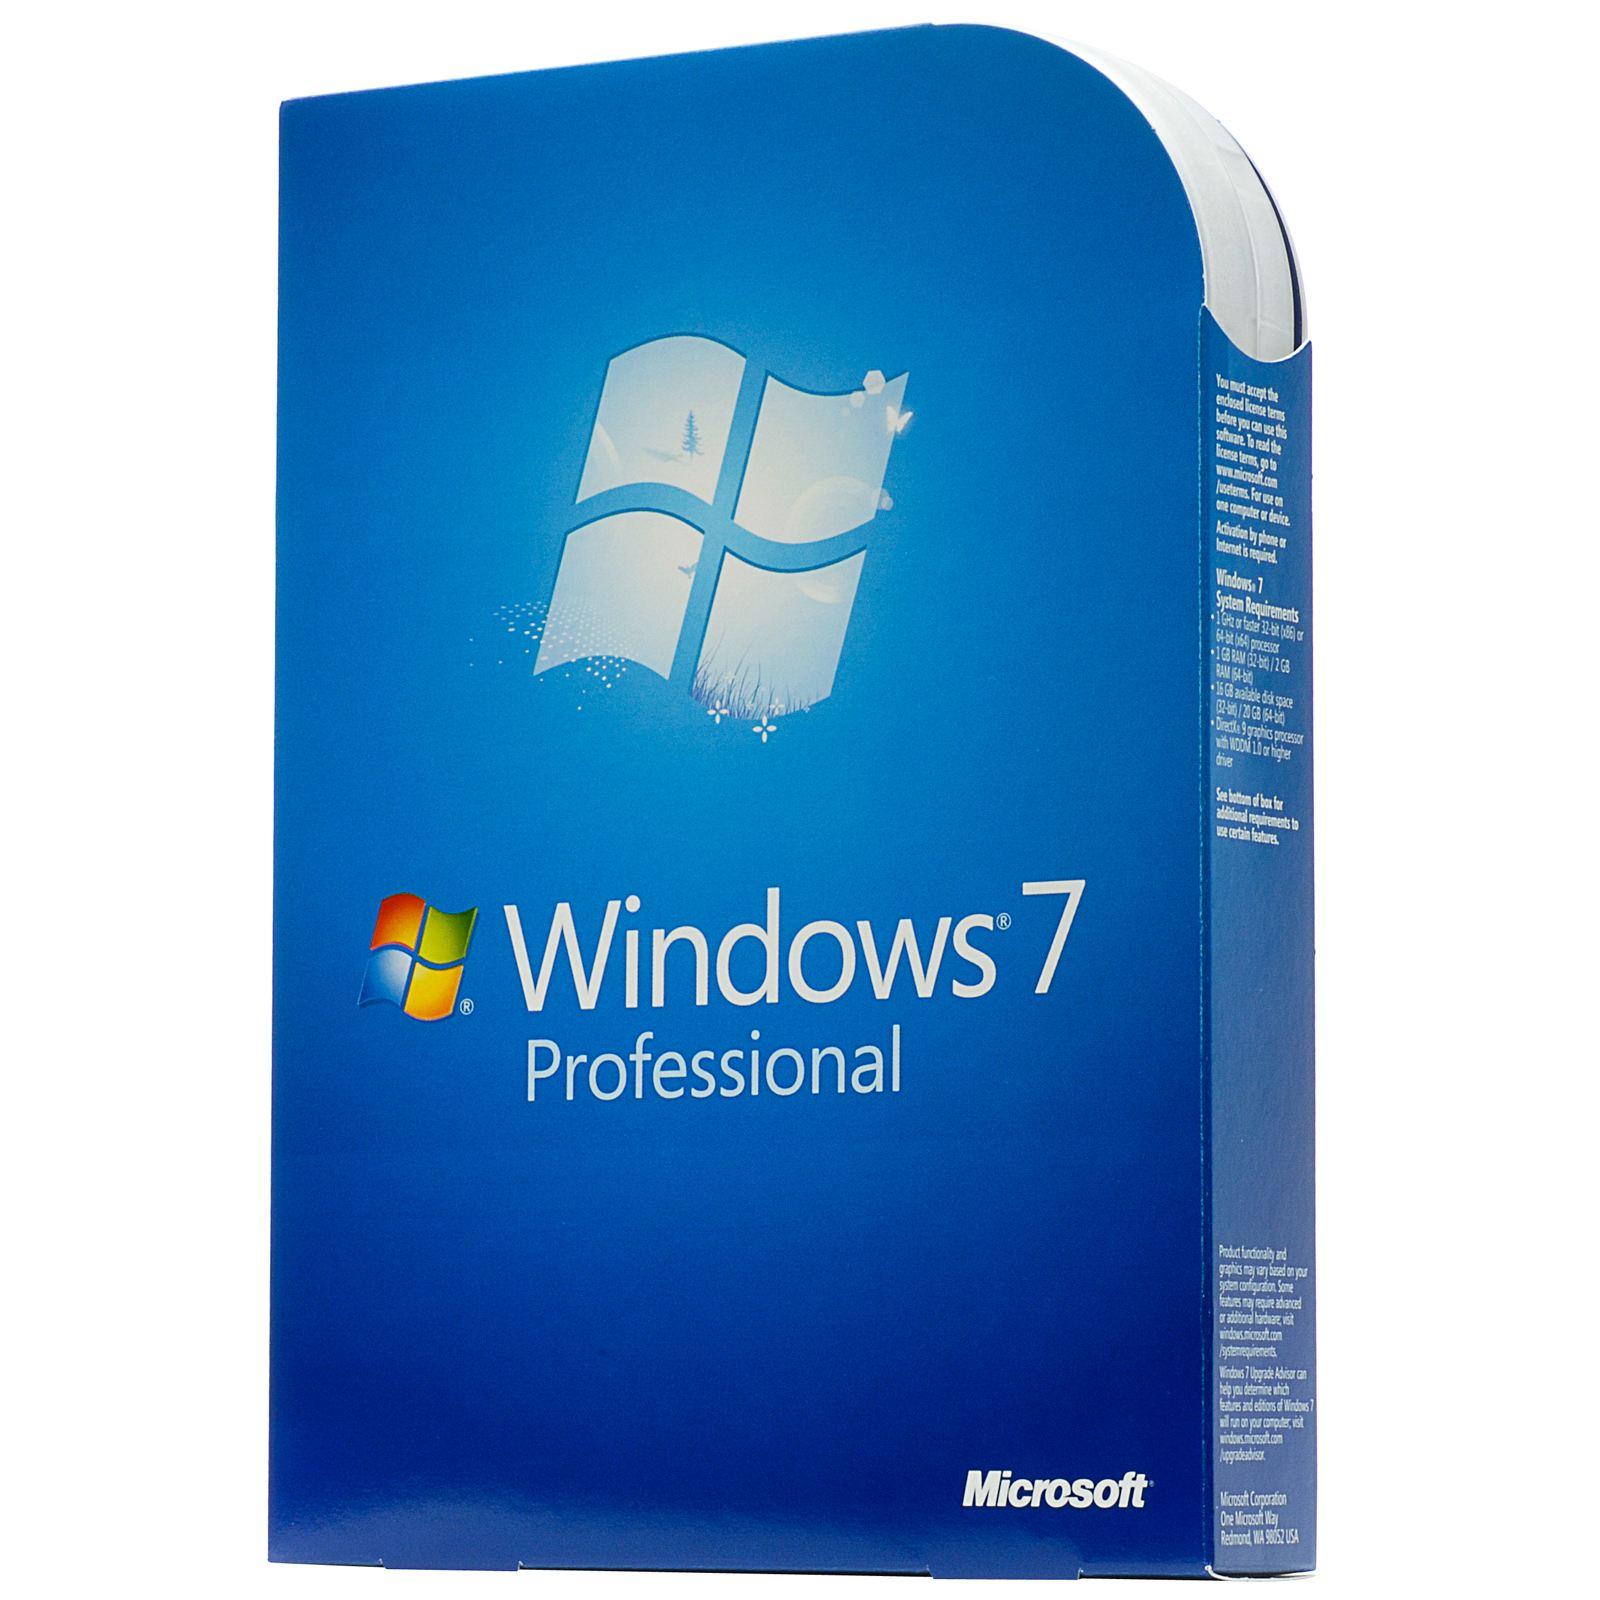 windows 7 64 bit language pack